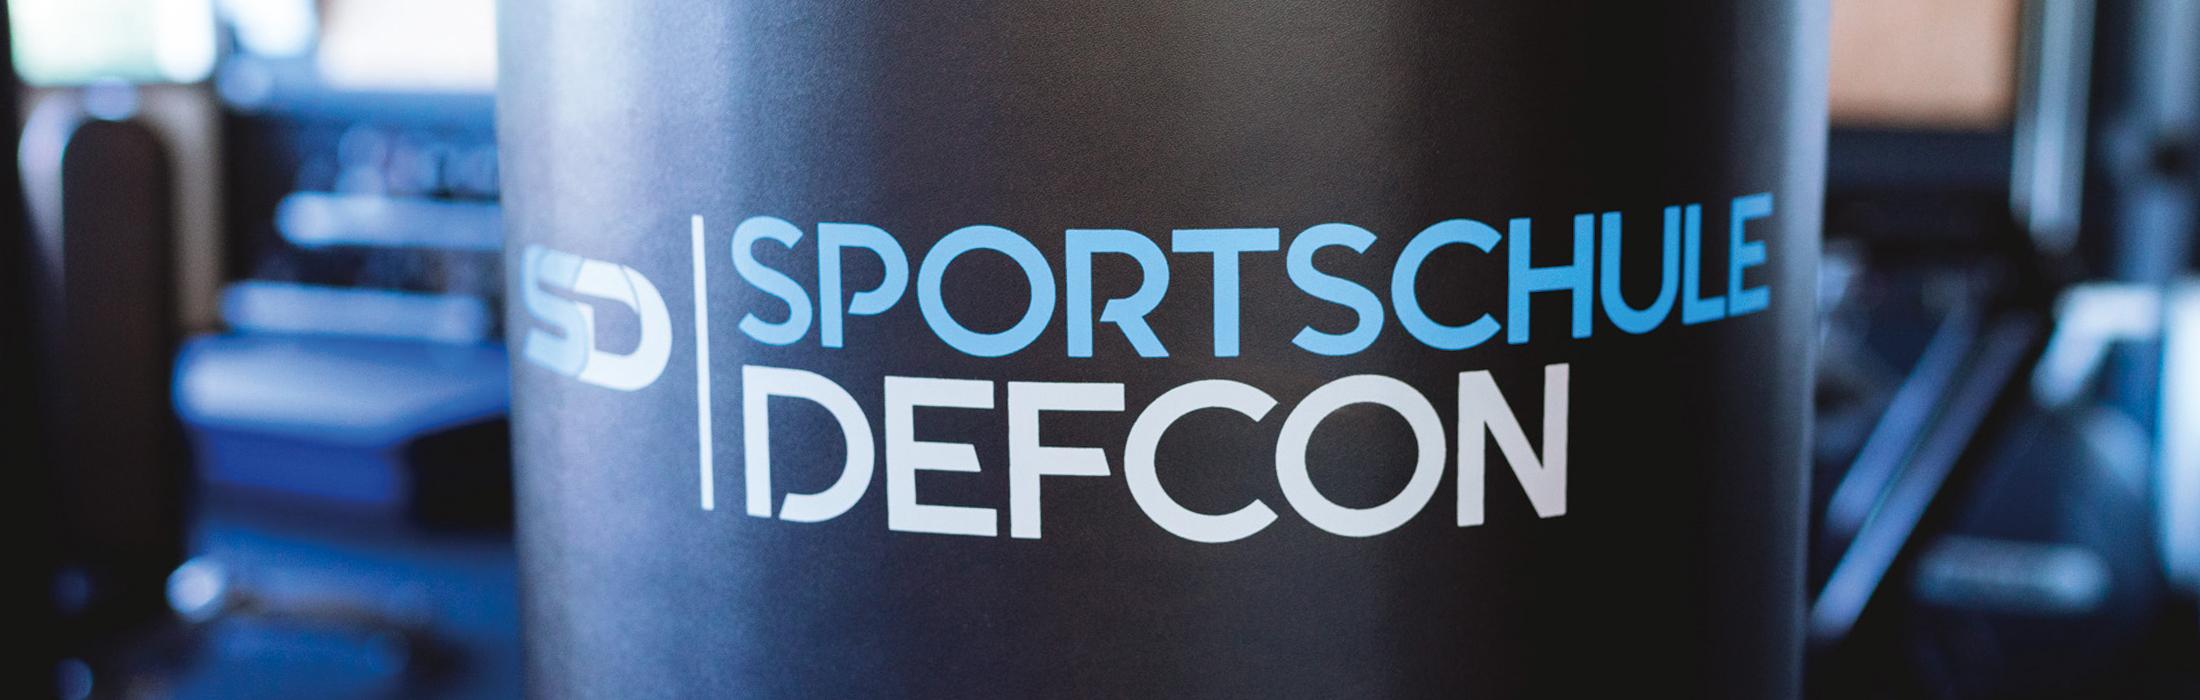 Sportschule DEFCON®